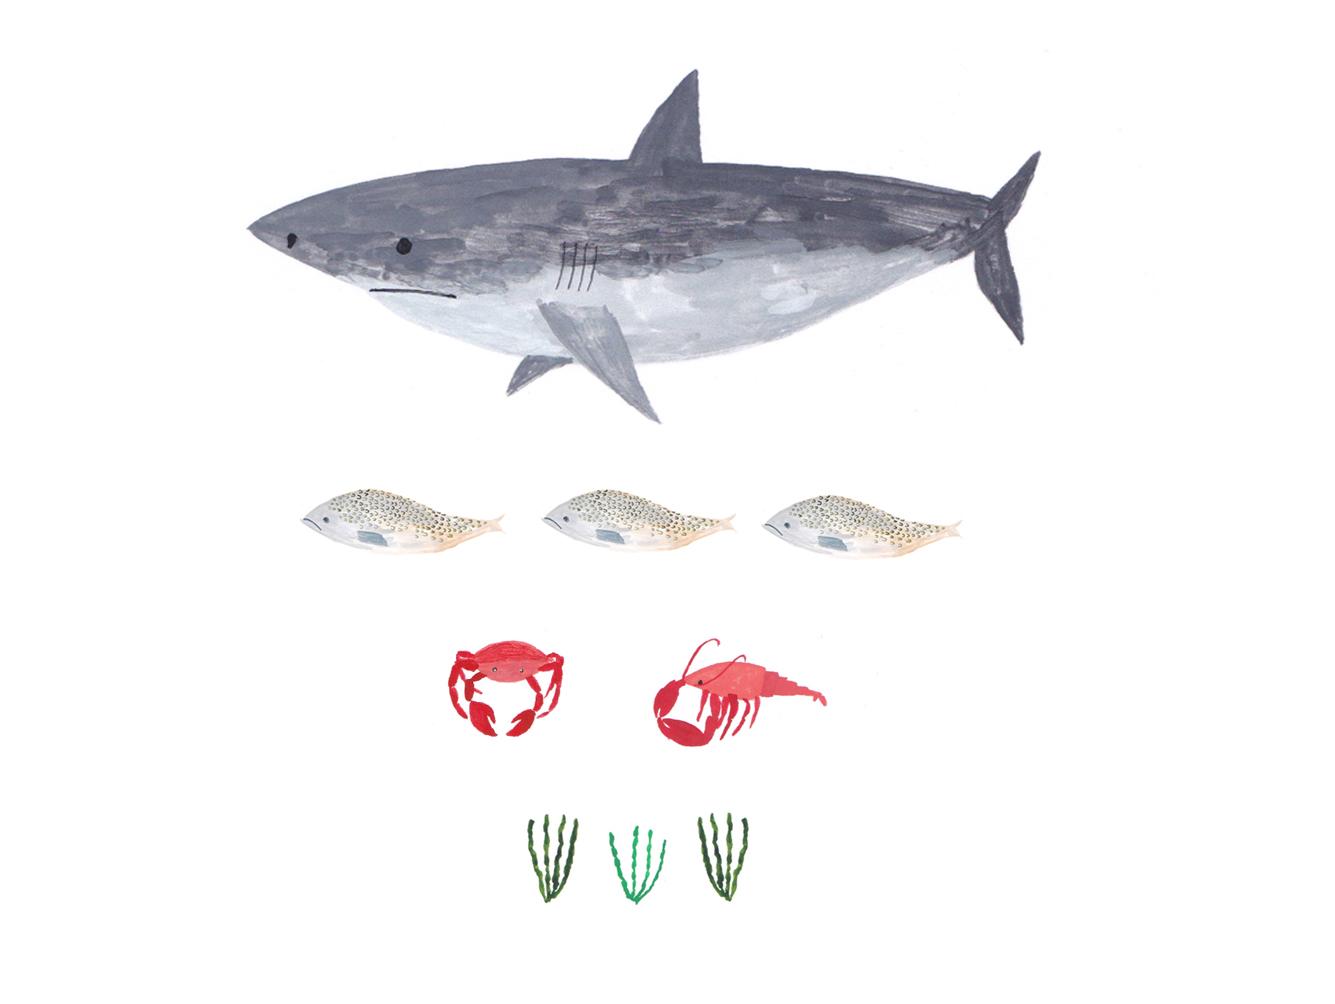 seaweed image 3 - food chain.jpg